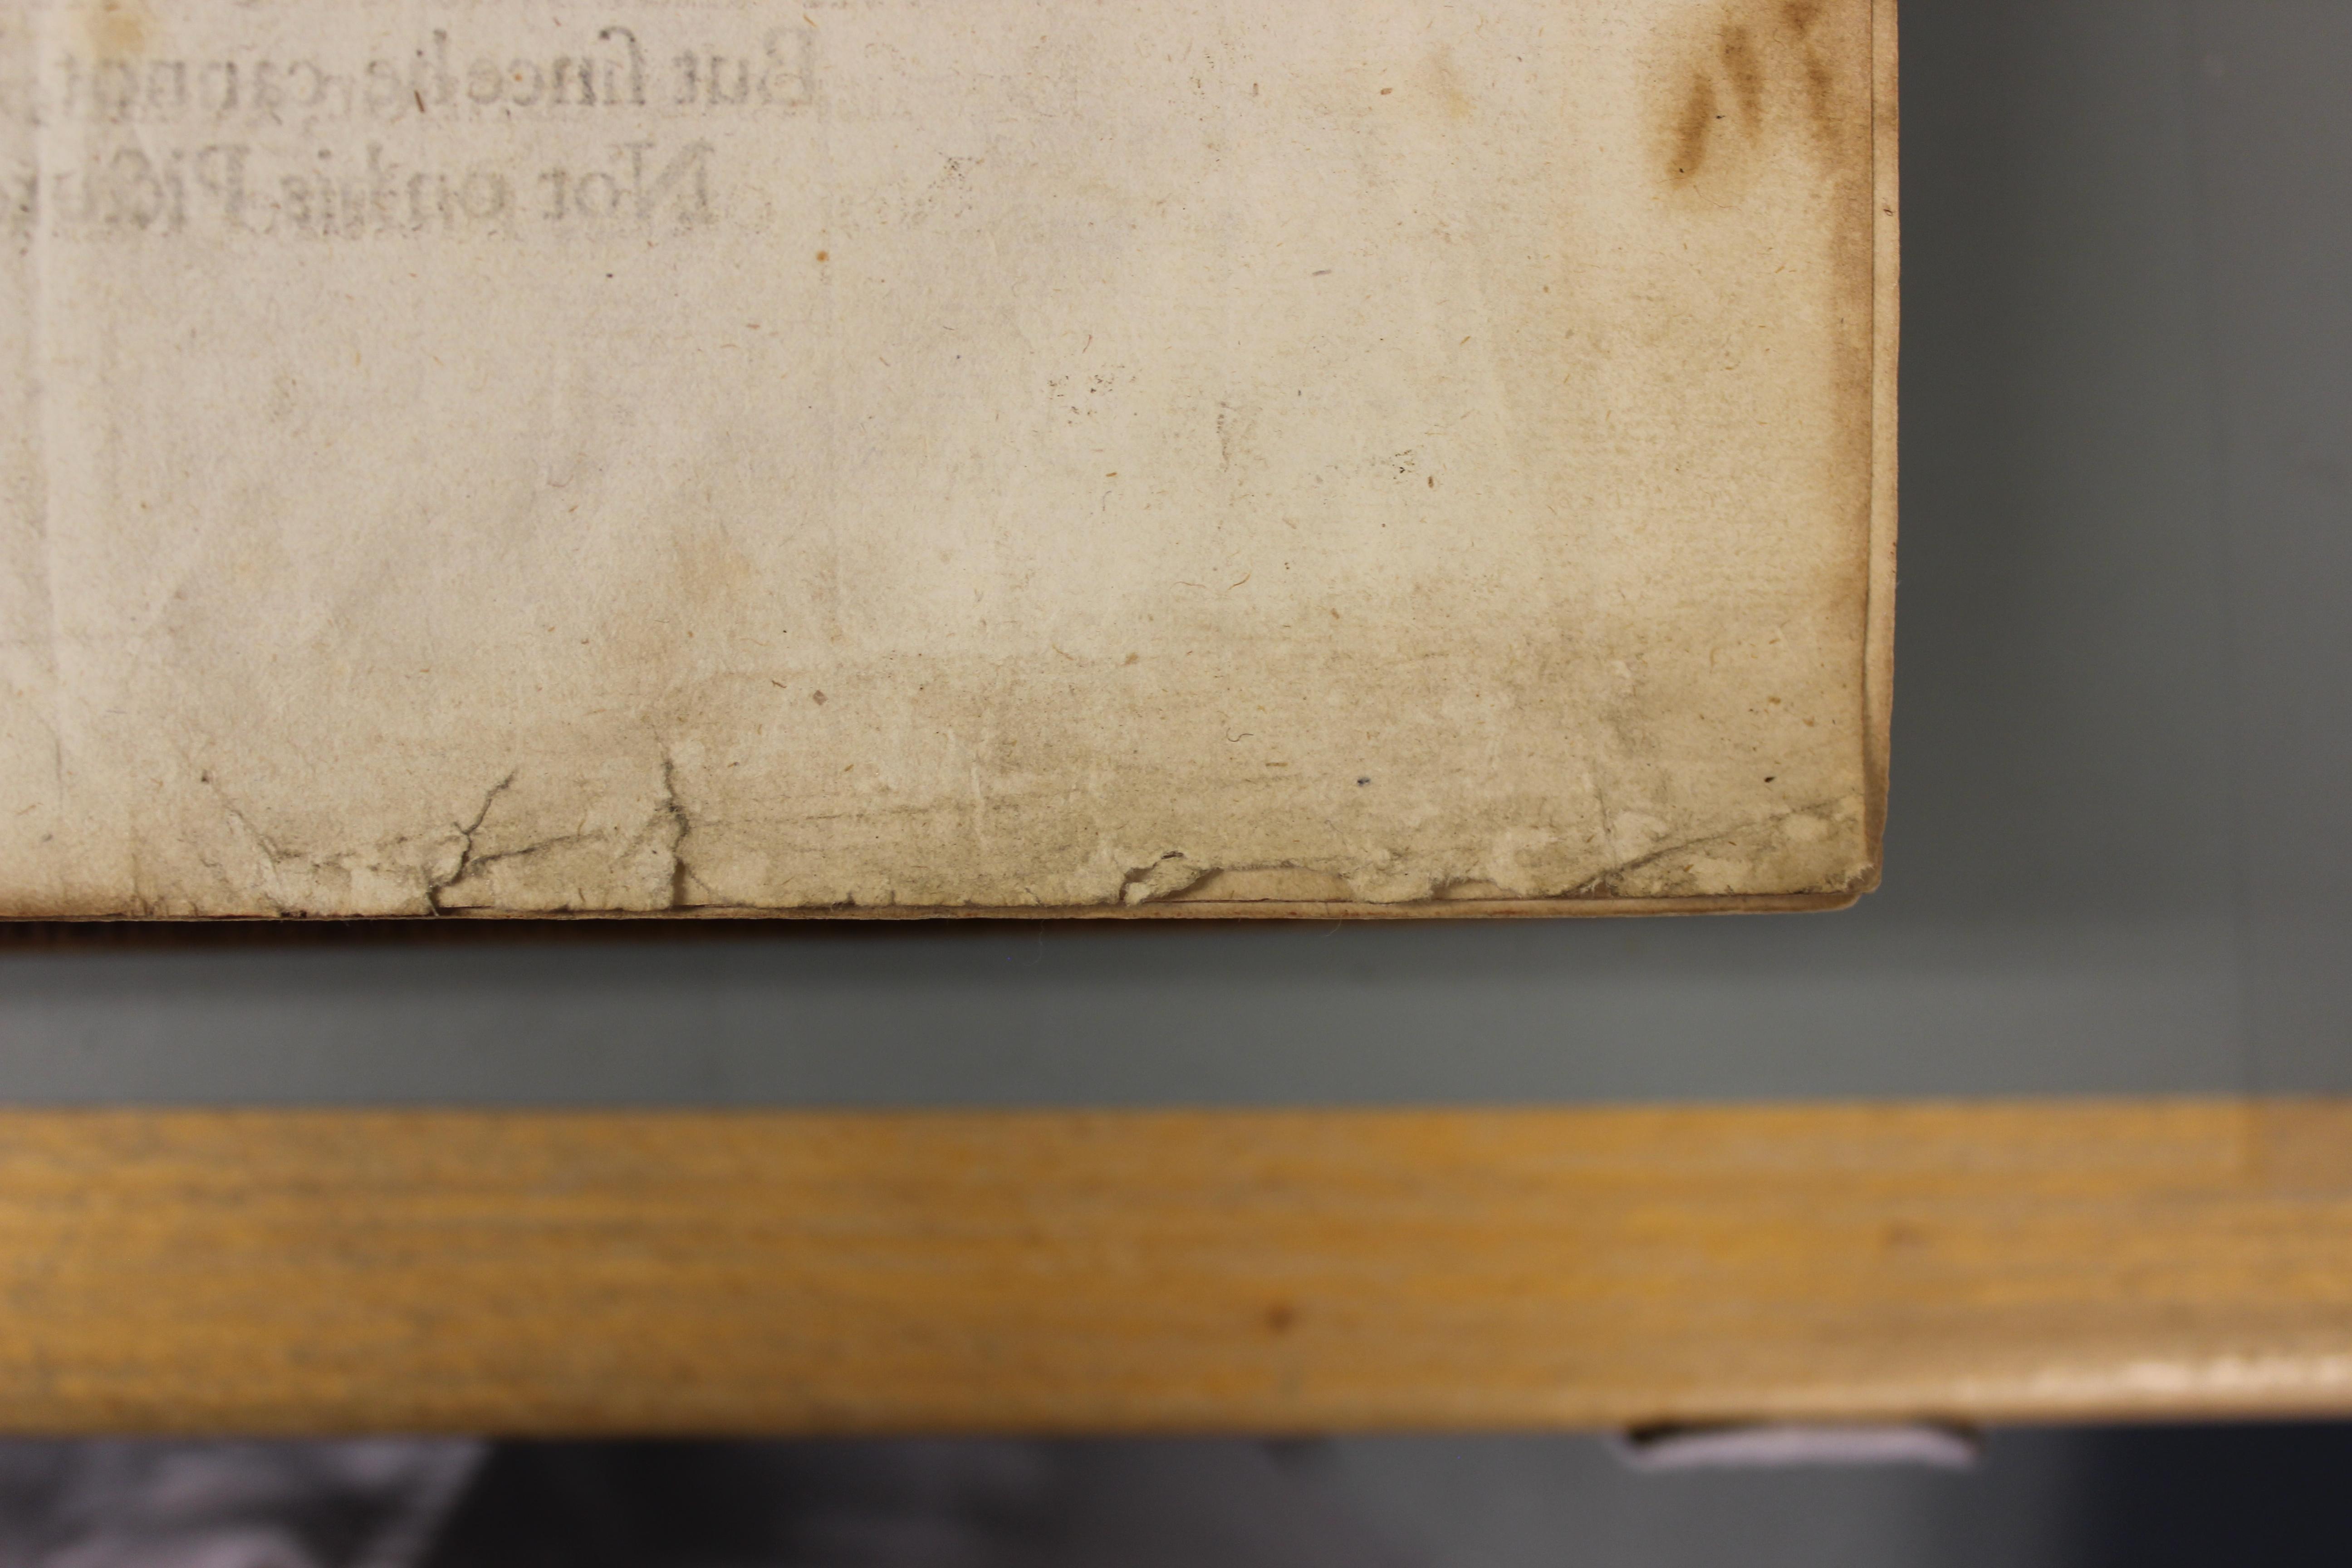 Fouth Folio 16